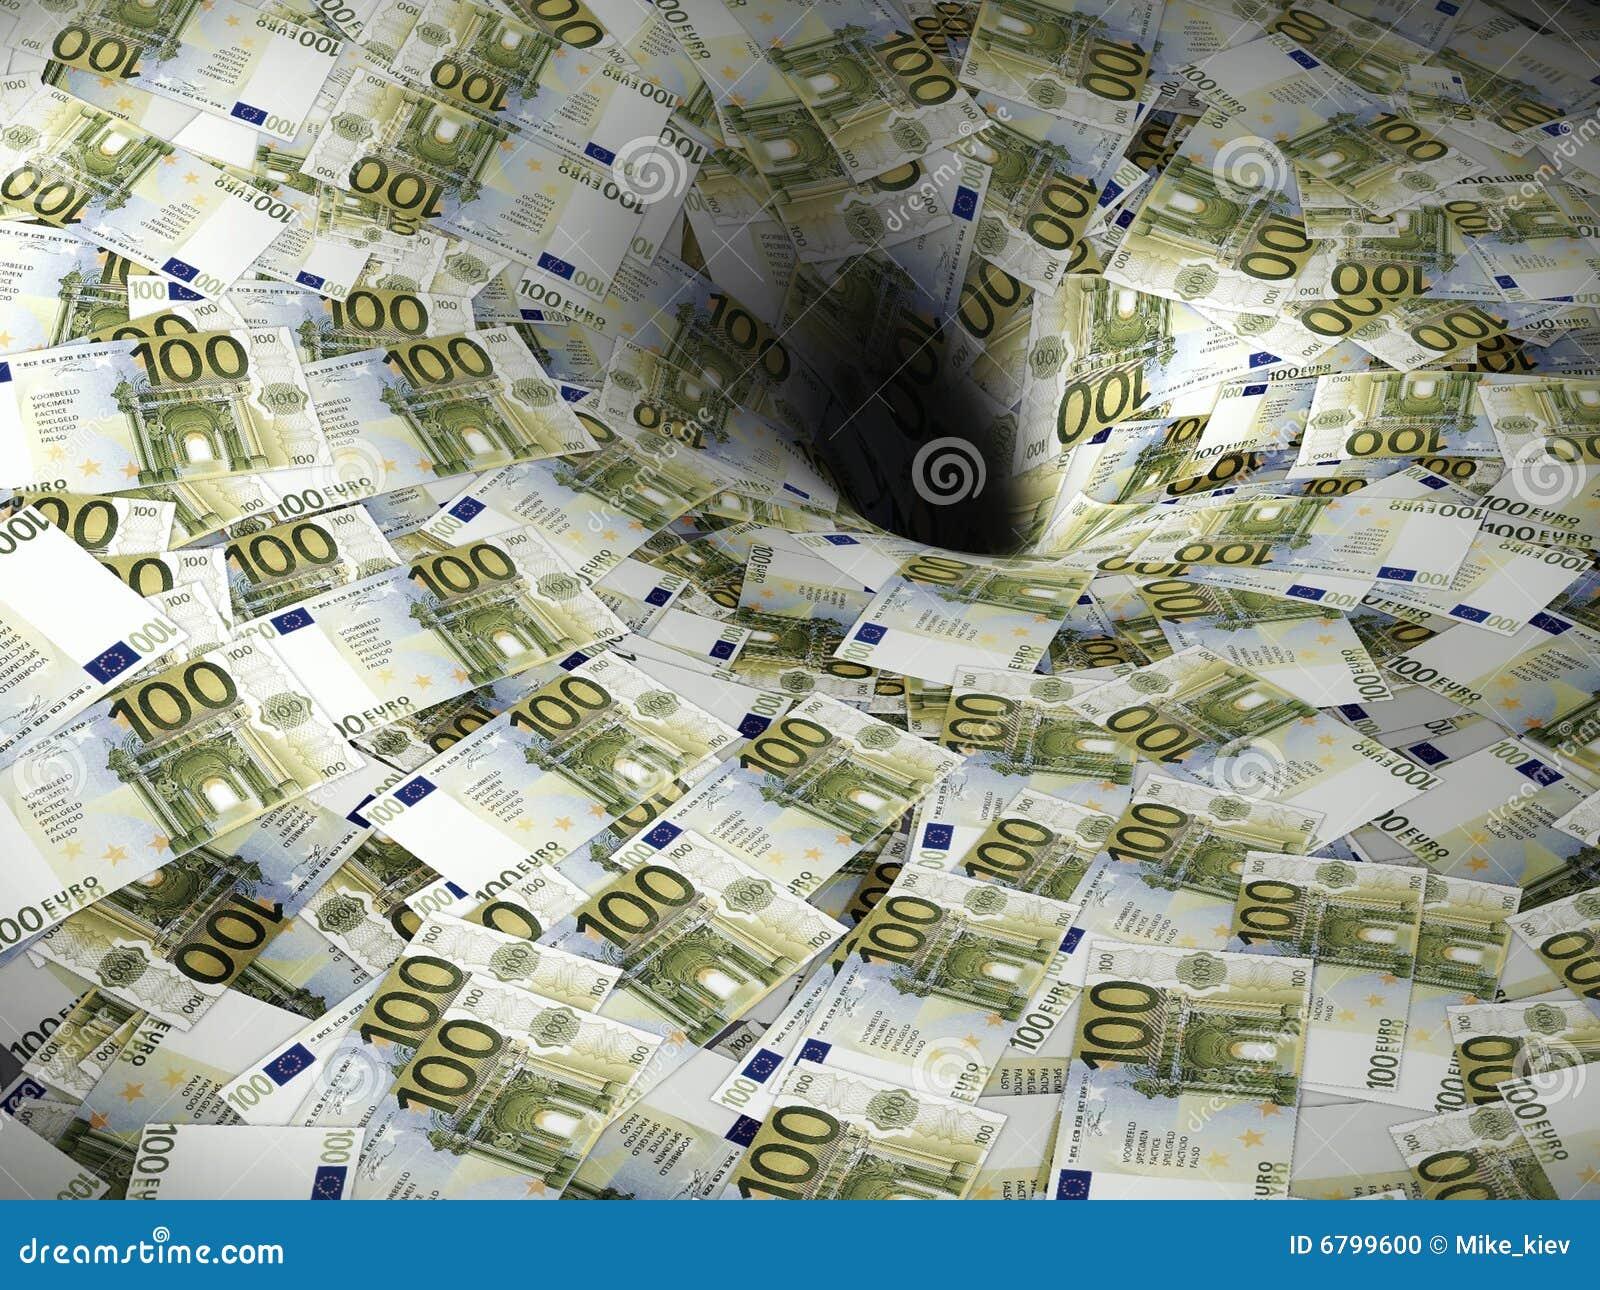 euro money flow in black hole stock photo image of fall euro 6799600